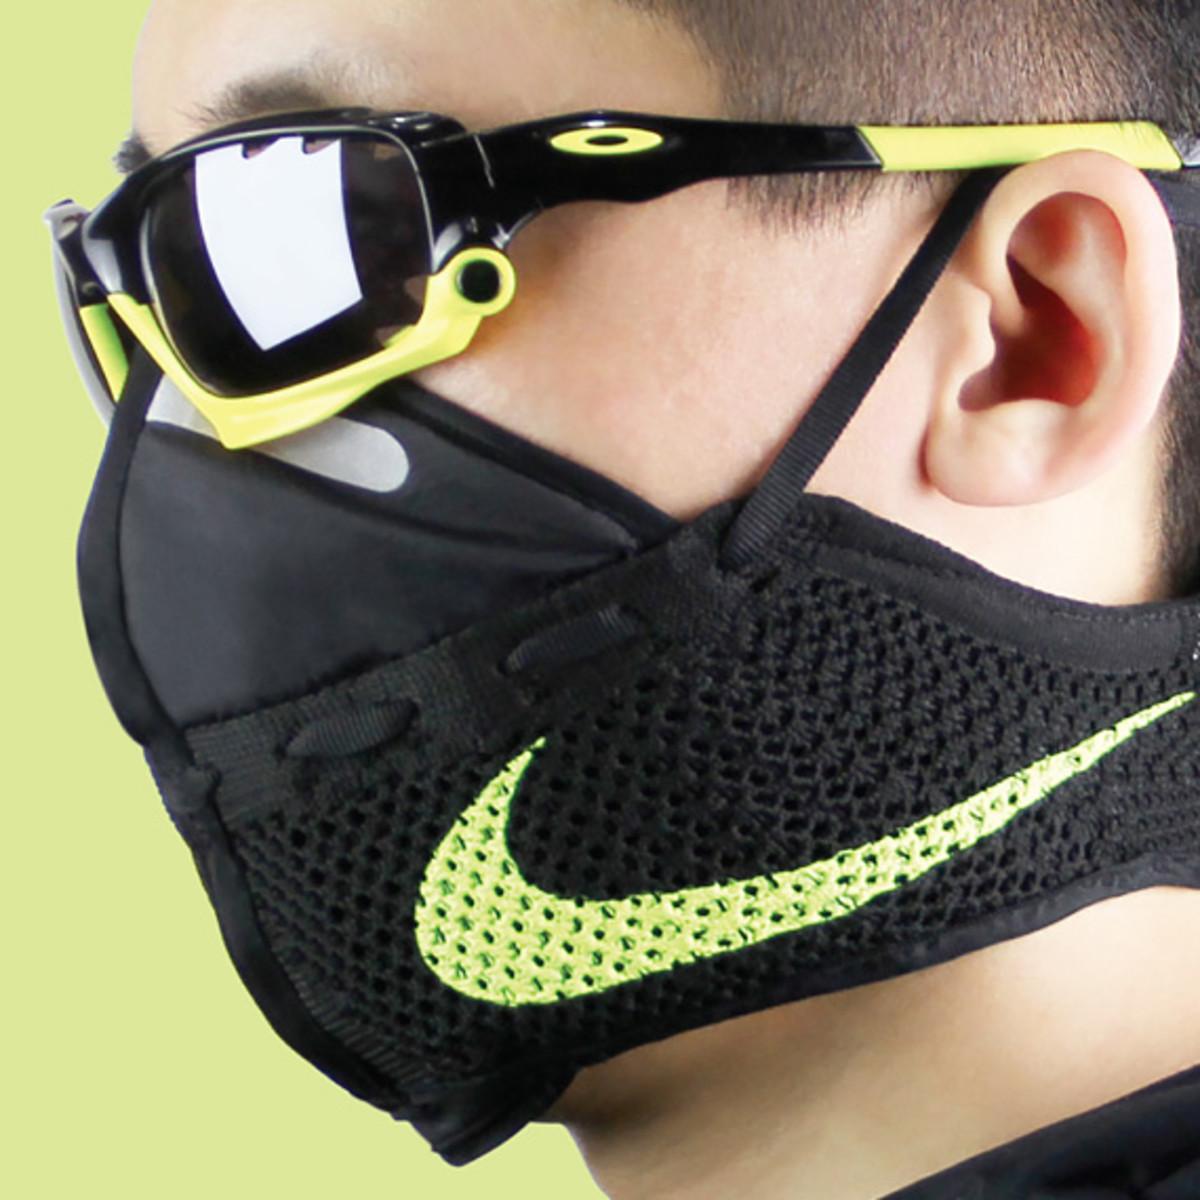 Nike flyknit mask by Zhijun Wang